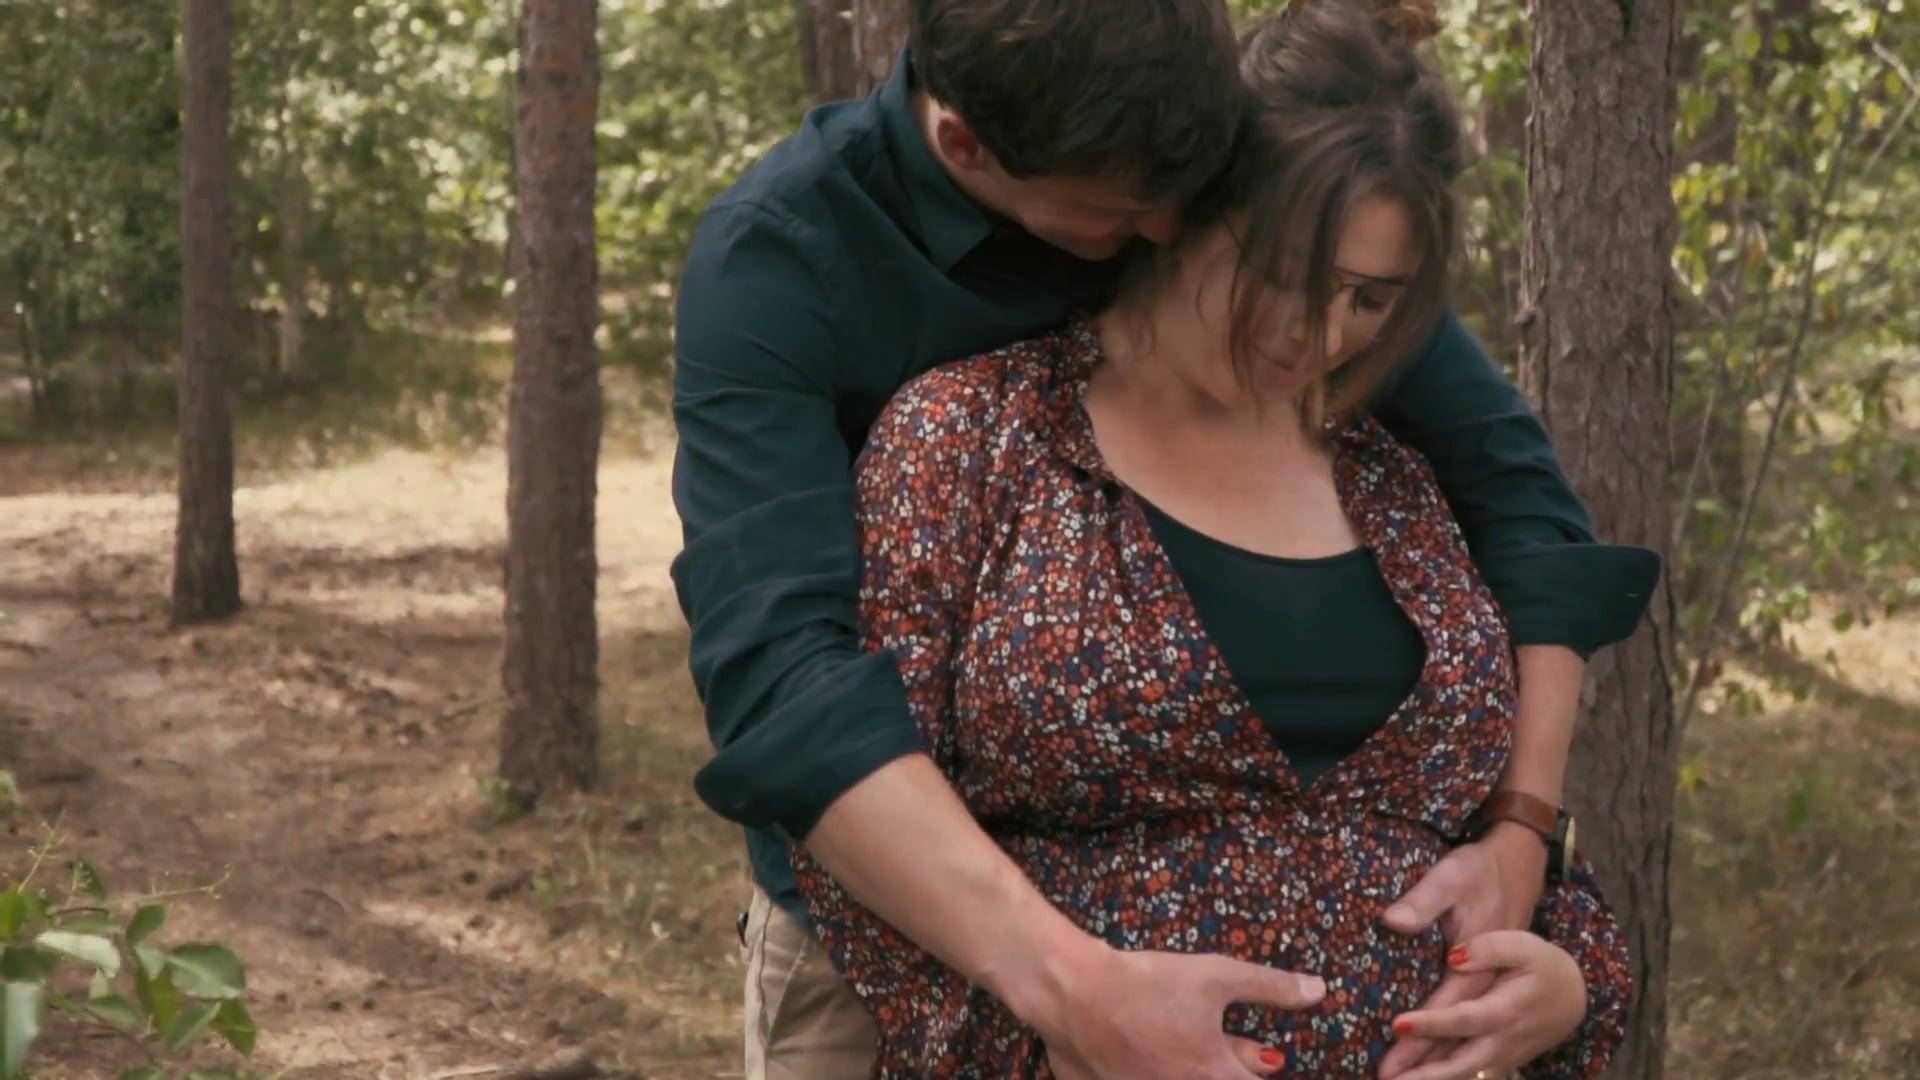 Toon & Lien - Pregnancy shoot 7.06.2020